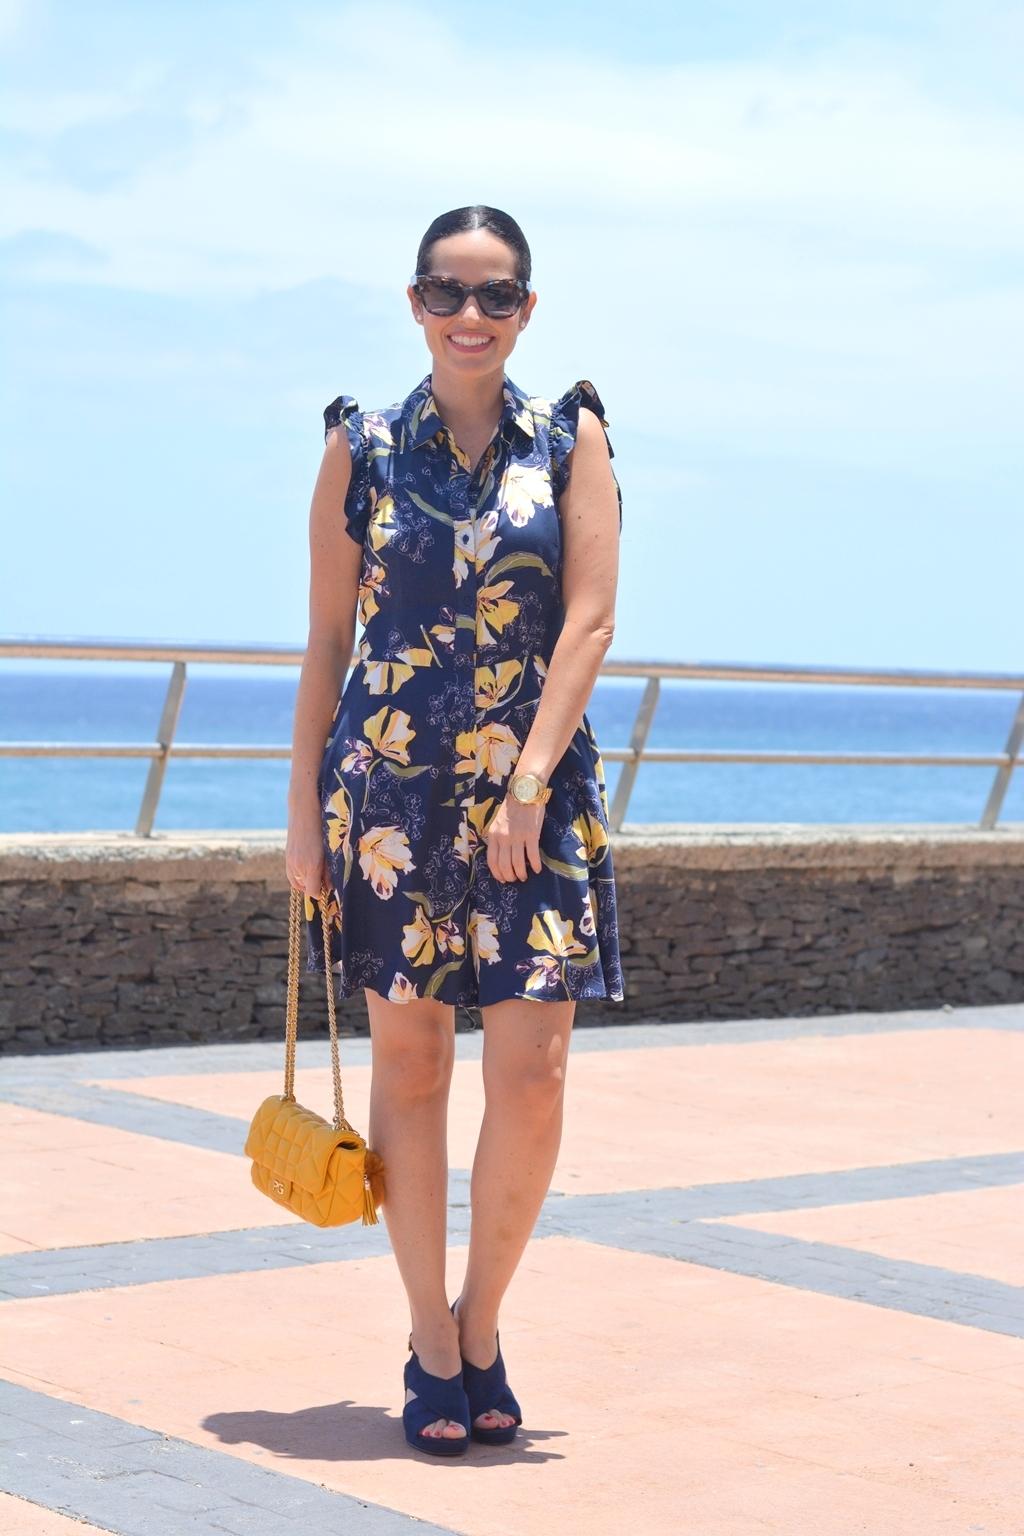 zara-outfit-moda-streetstyle-personalshopper